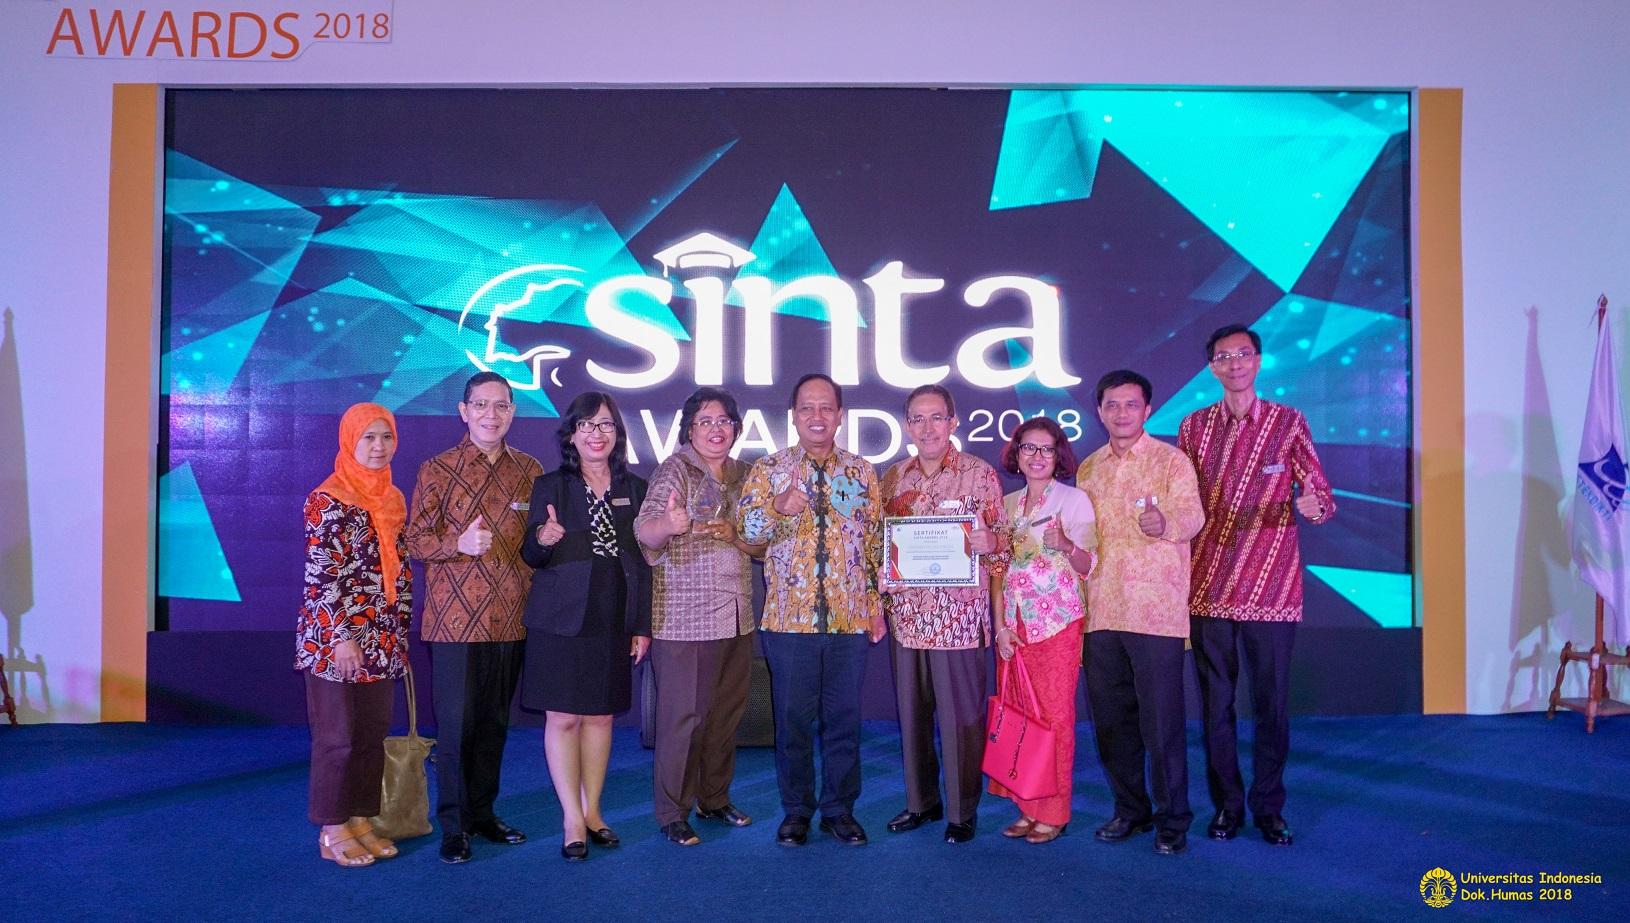 Foto: dok. Humas Universitas Indonesia